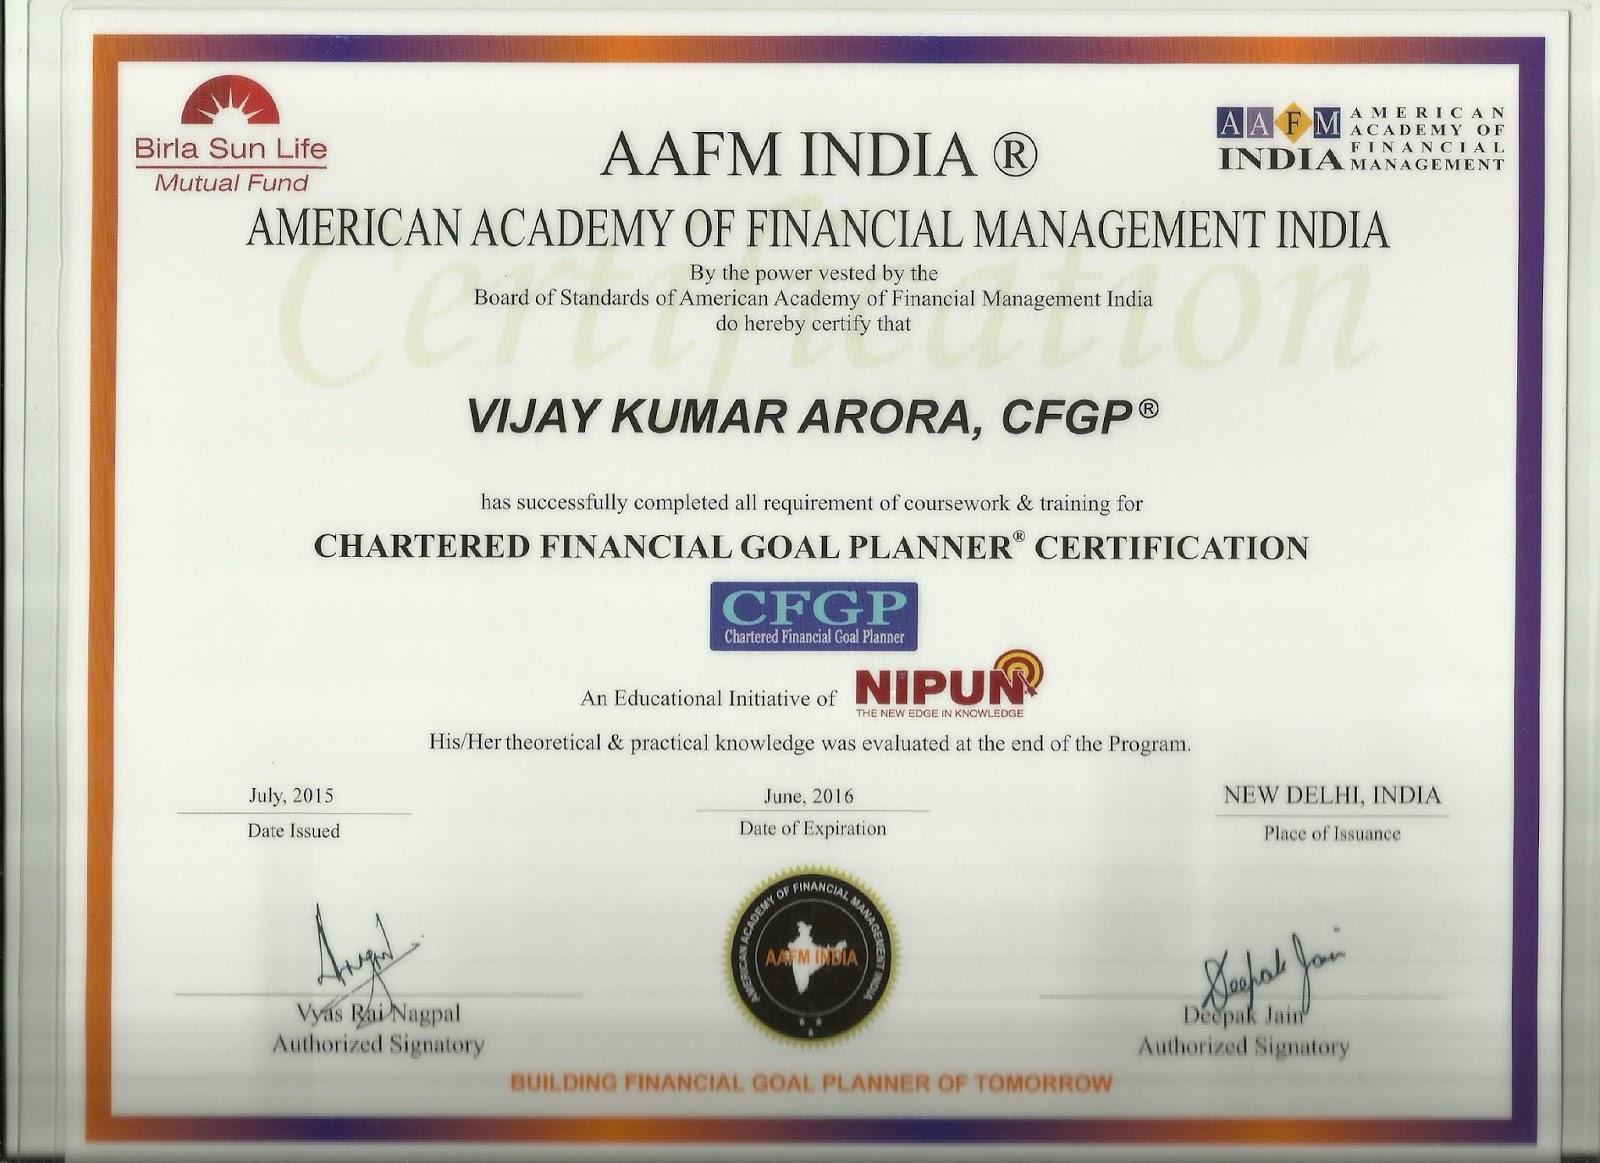 Chartered Financial Goal Planner Certification 31 07 2015